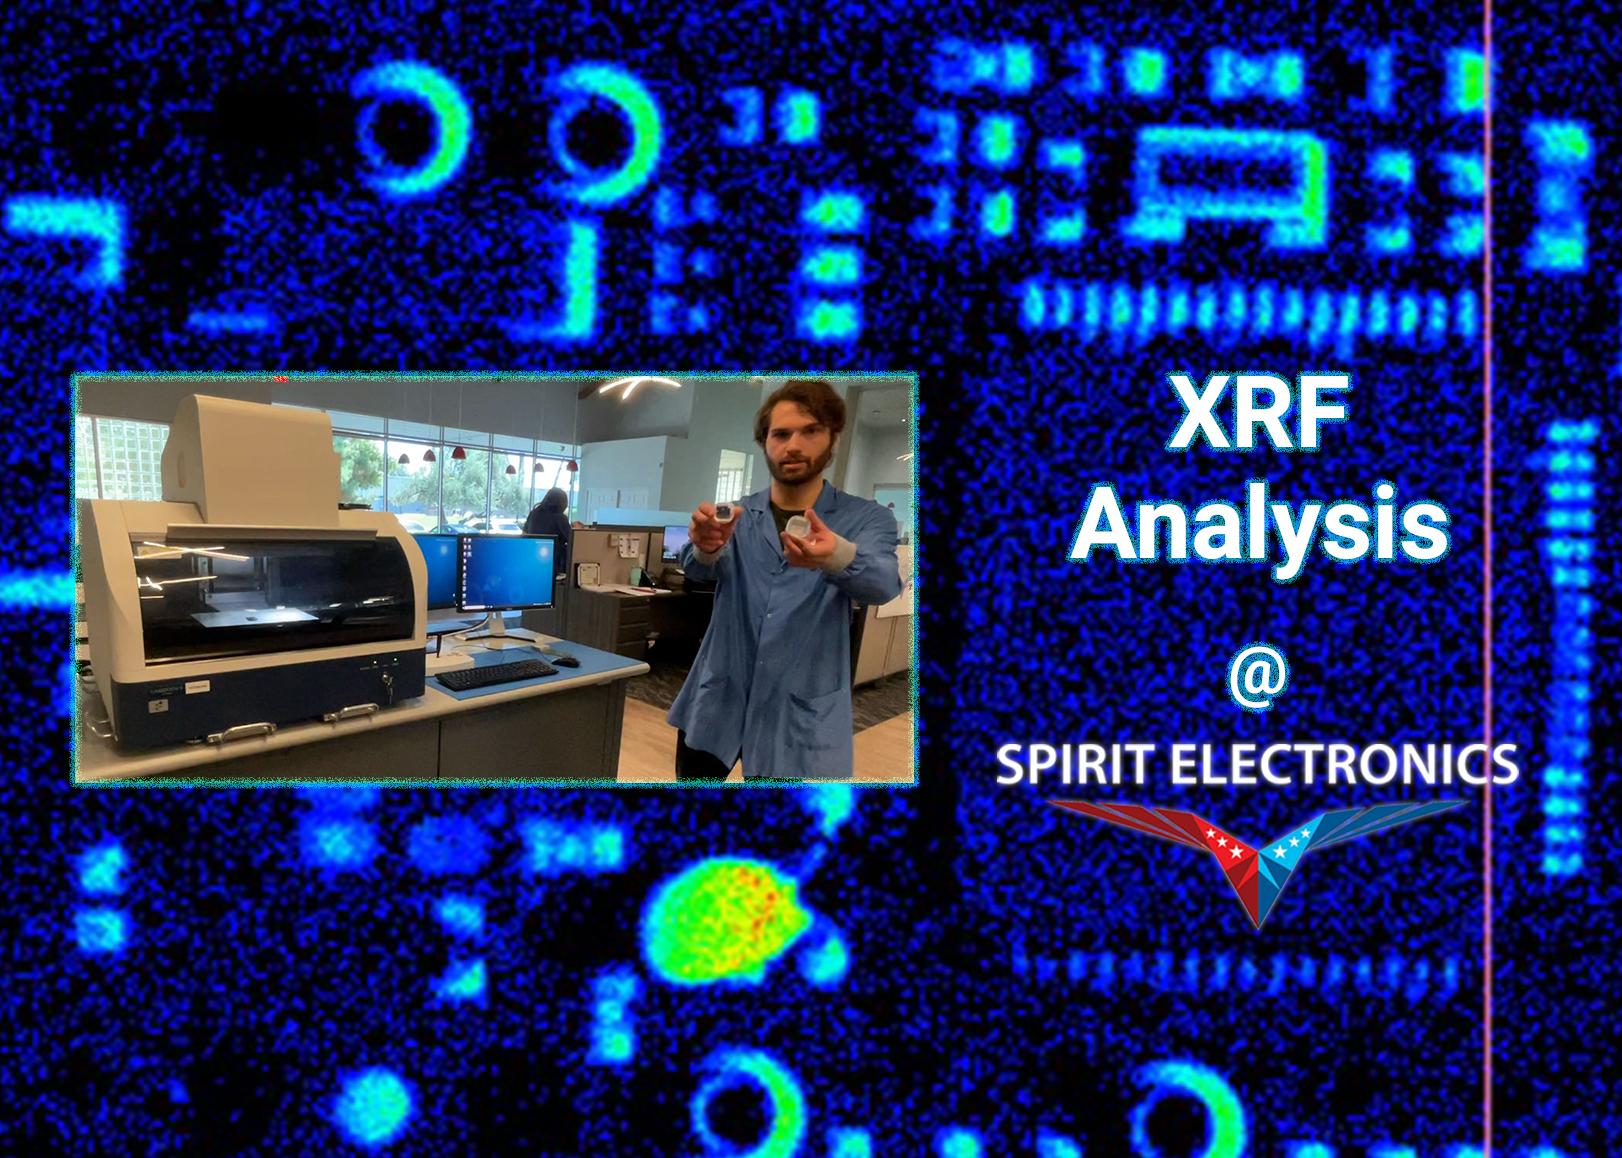 XRF Analysis Nick Pb scan